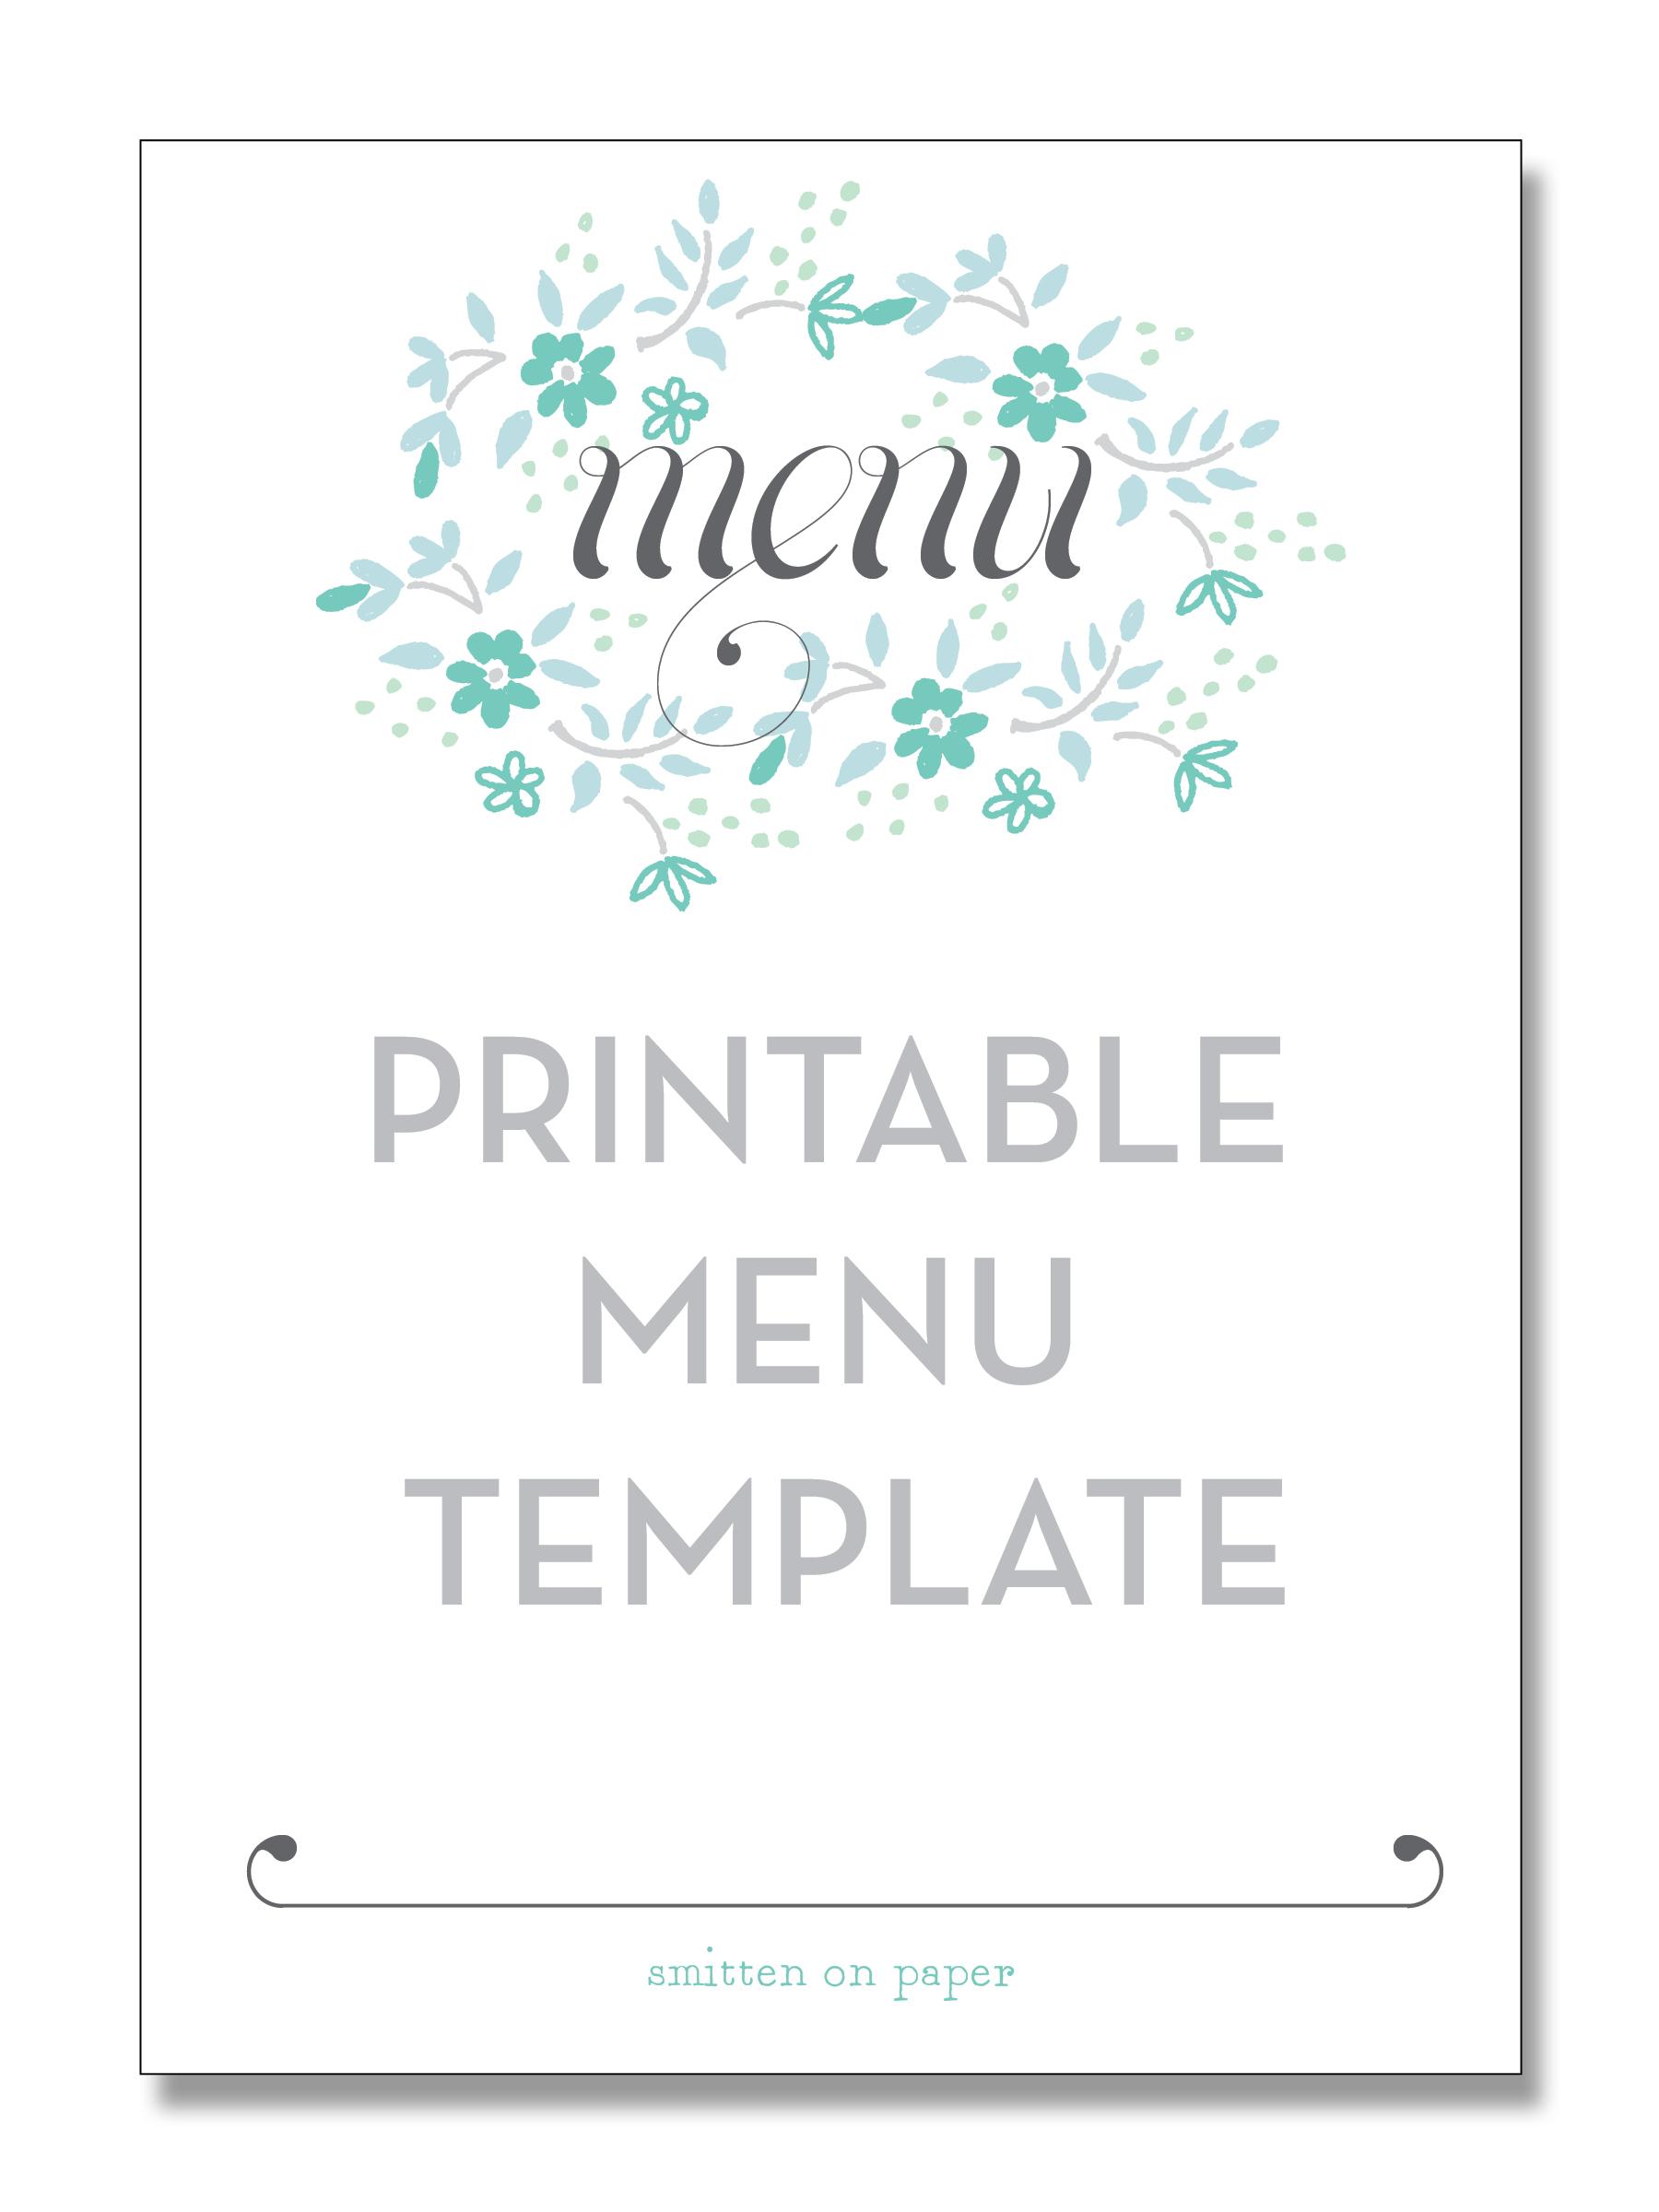 Printable Party Menu Templates